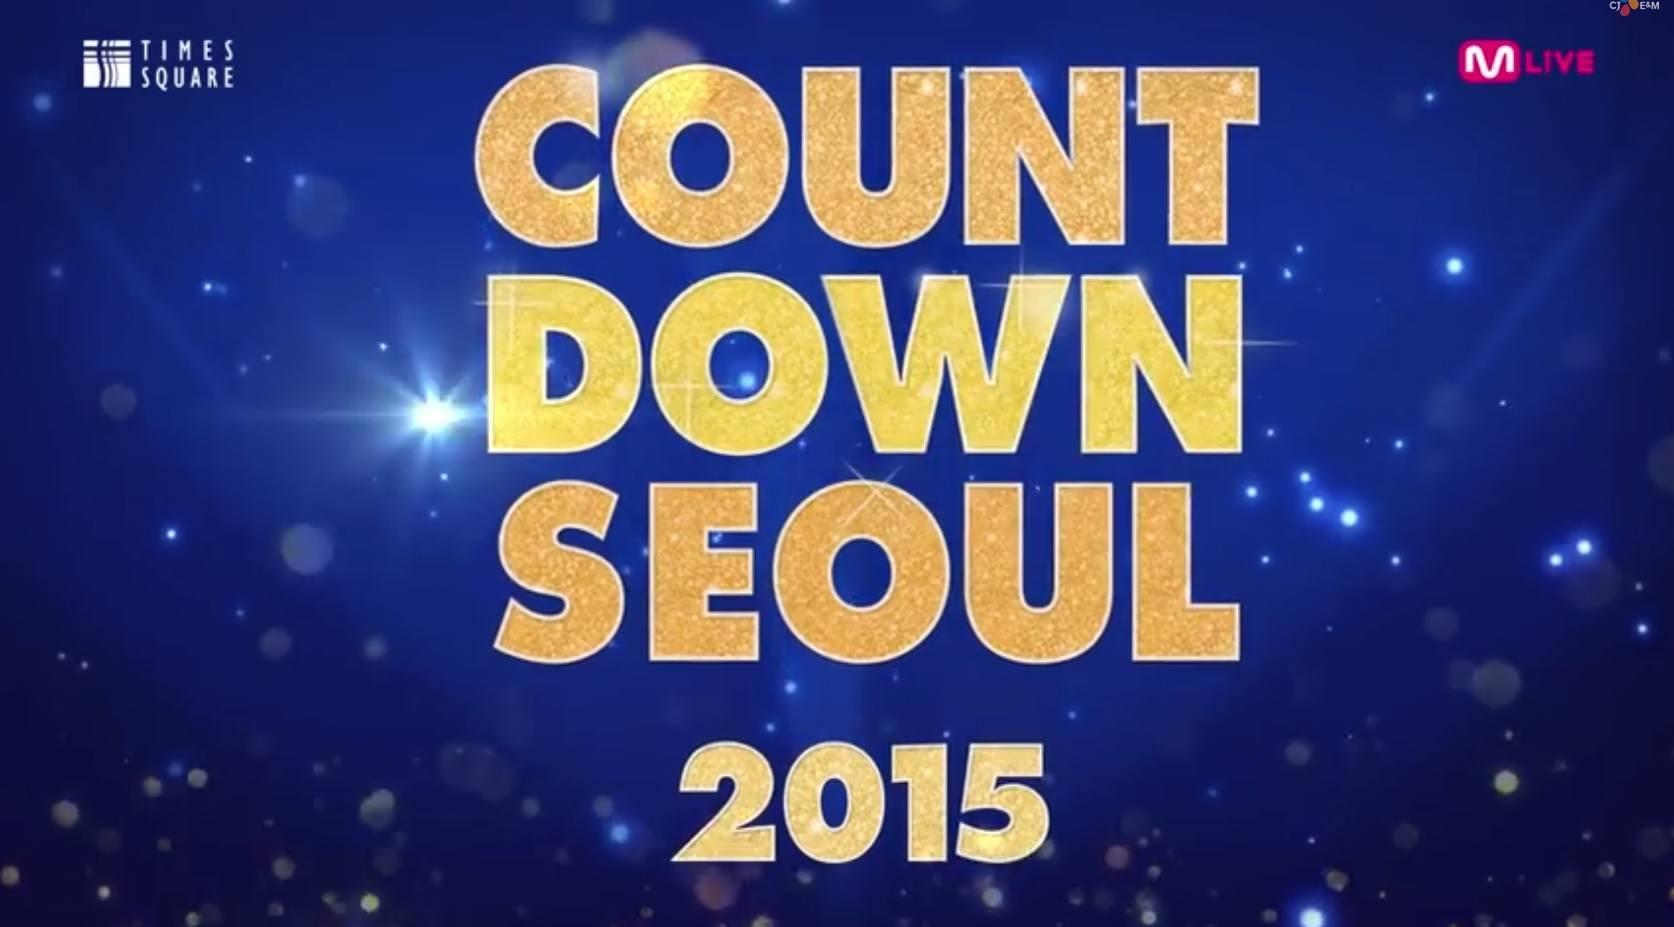 2015 Countdown Seoul Lineup!